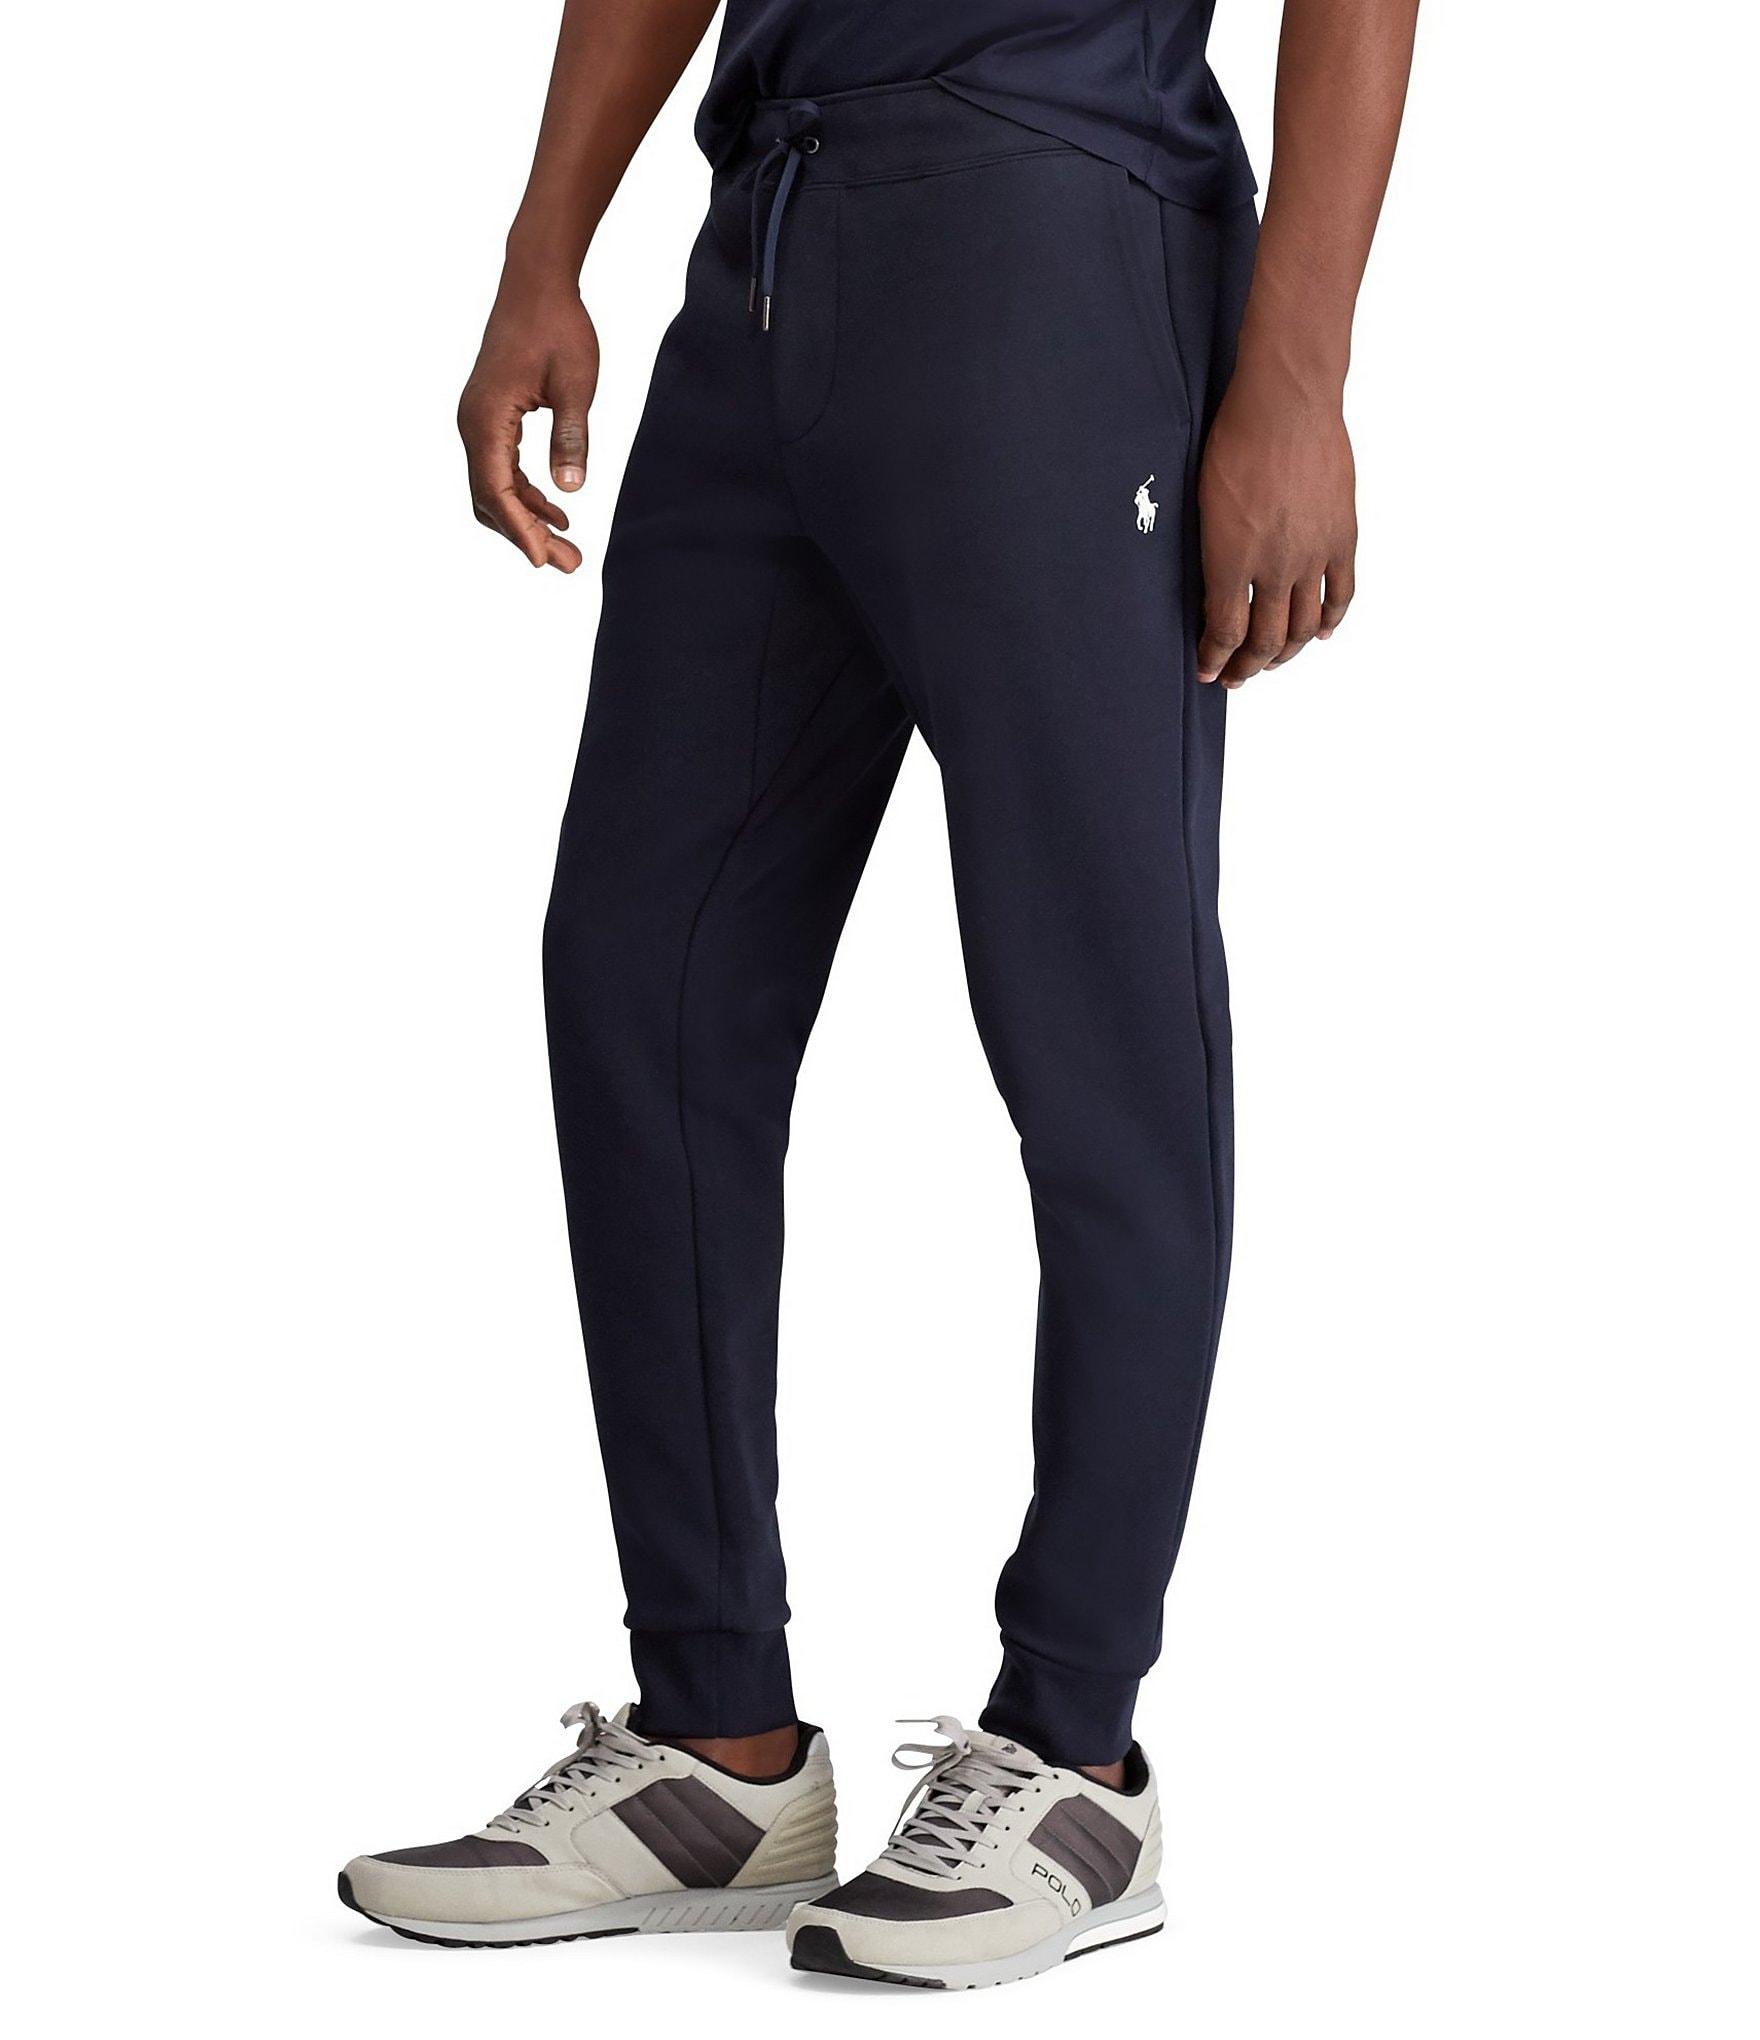 Tall Polo Tech Knit Ralph Lauren Bigamp; Pants Double Jogger srxhCtdQ